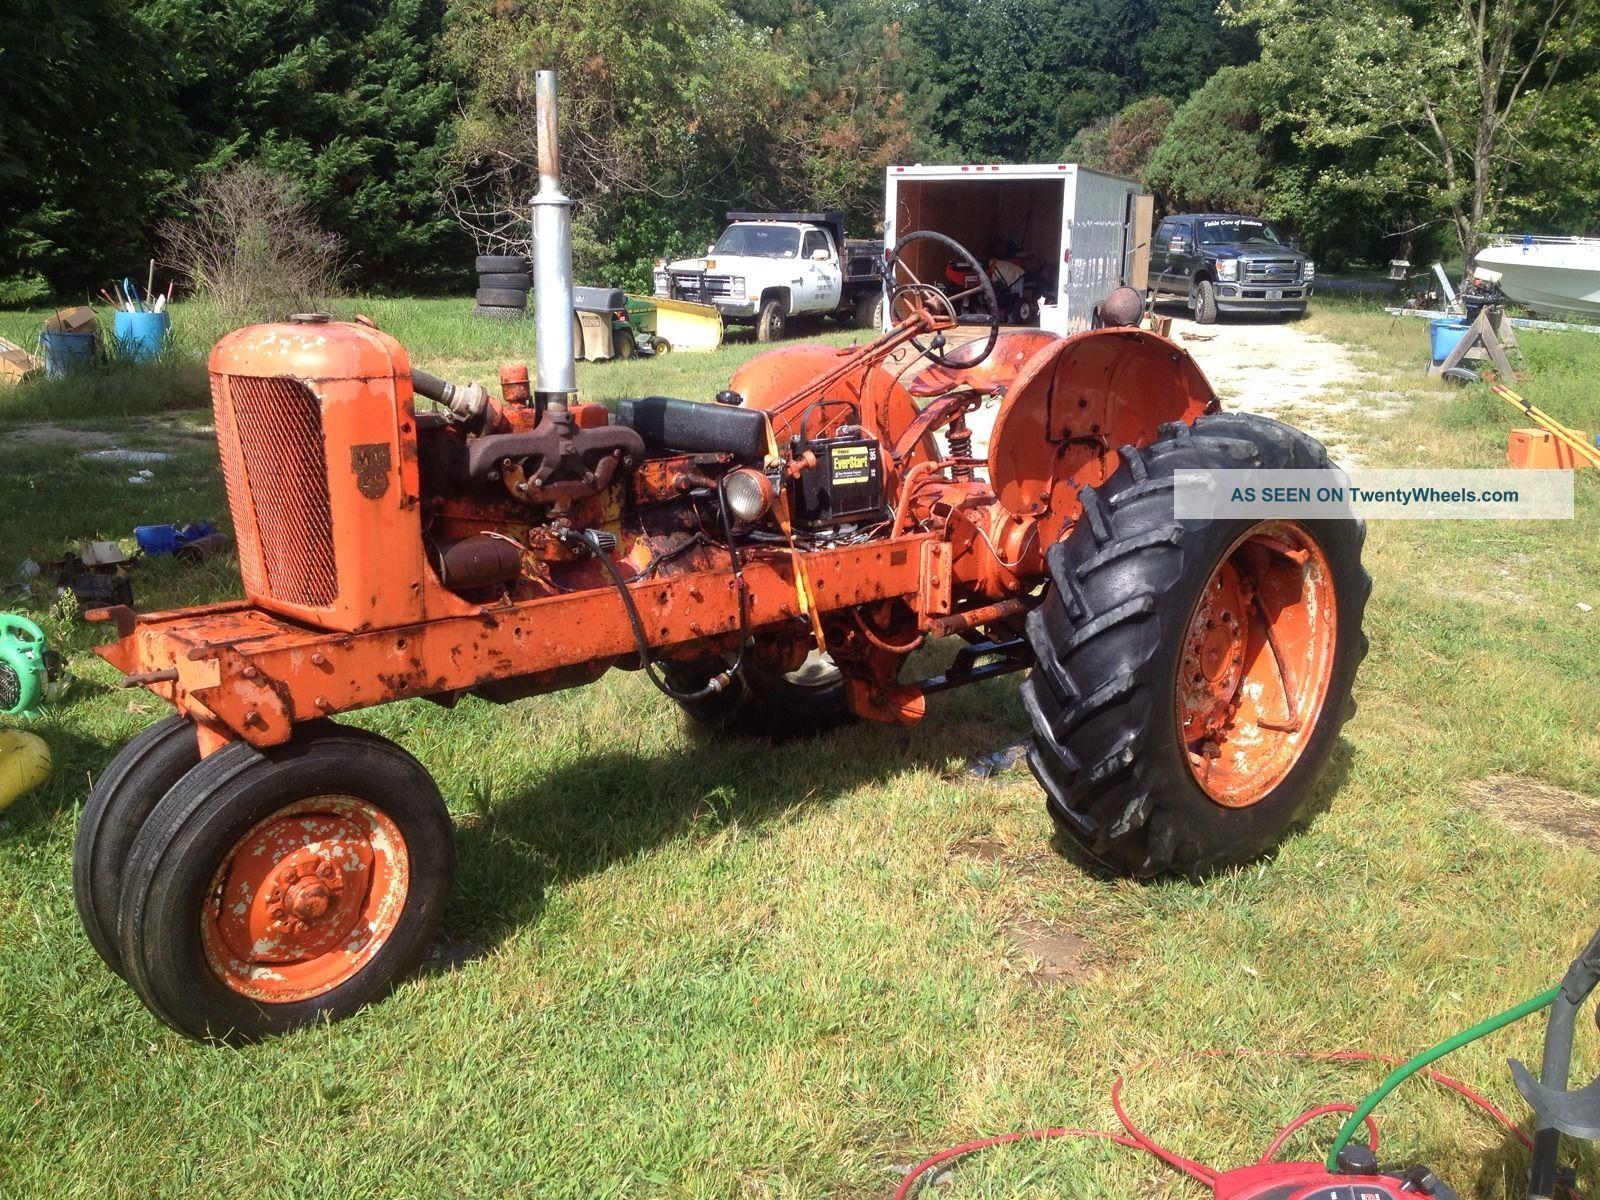 Vintage Allis Chalmers Tractors : Allis chalmers wd antique vintage farm tractor works great